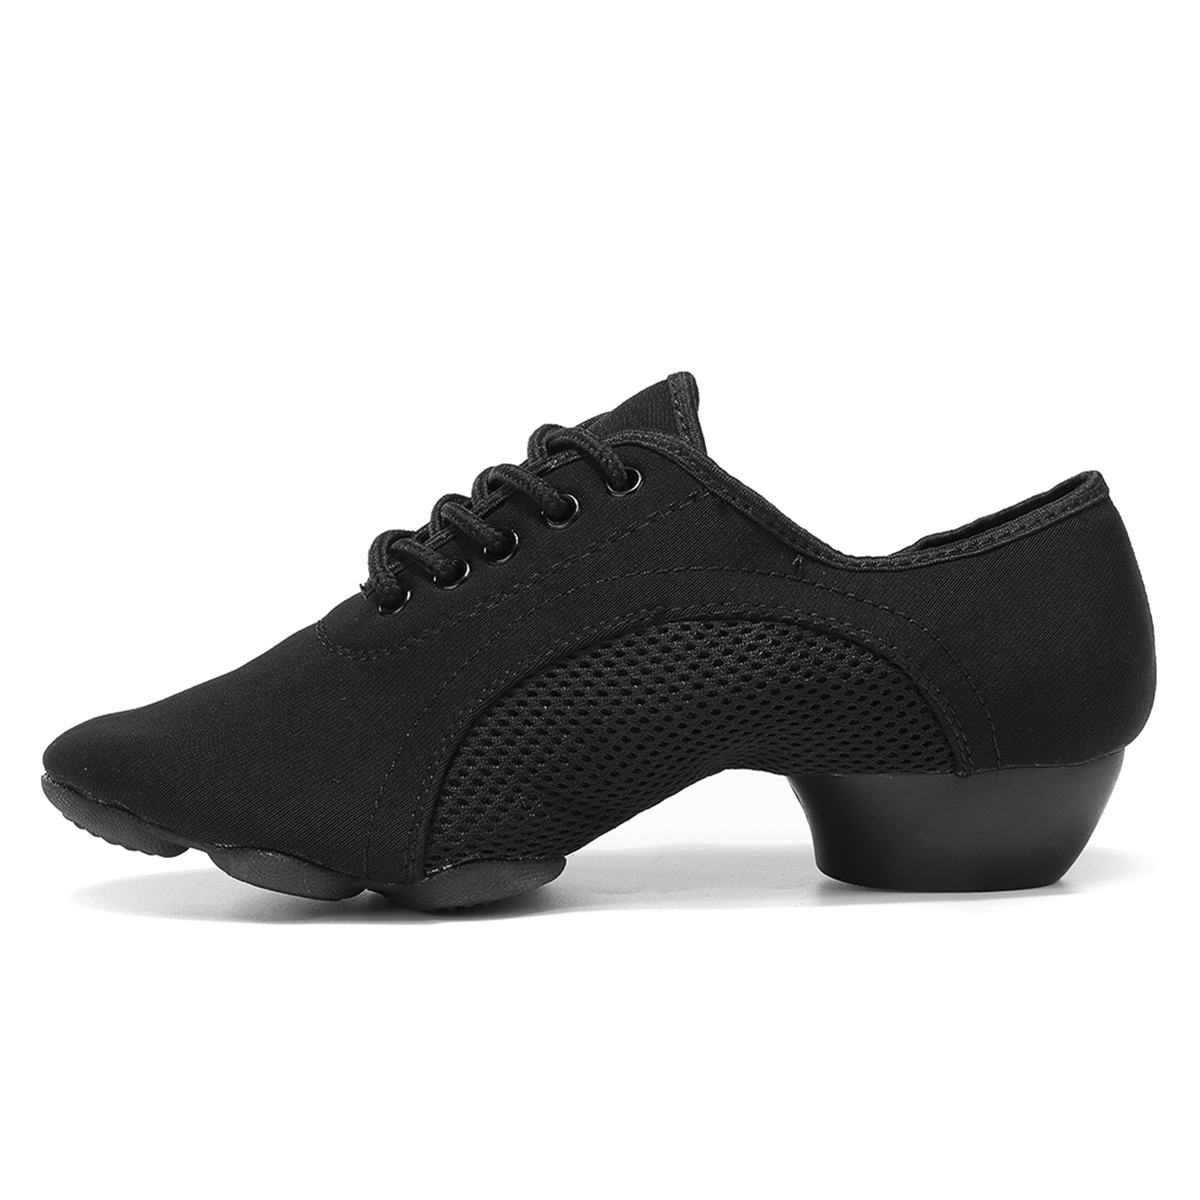 AU Women Two-point Modern Latin Tango Jazz Dance Ballet Soft Sole Shoes Dancing